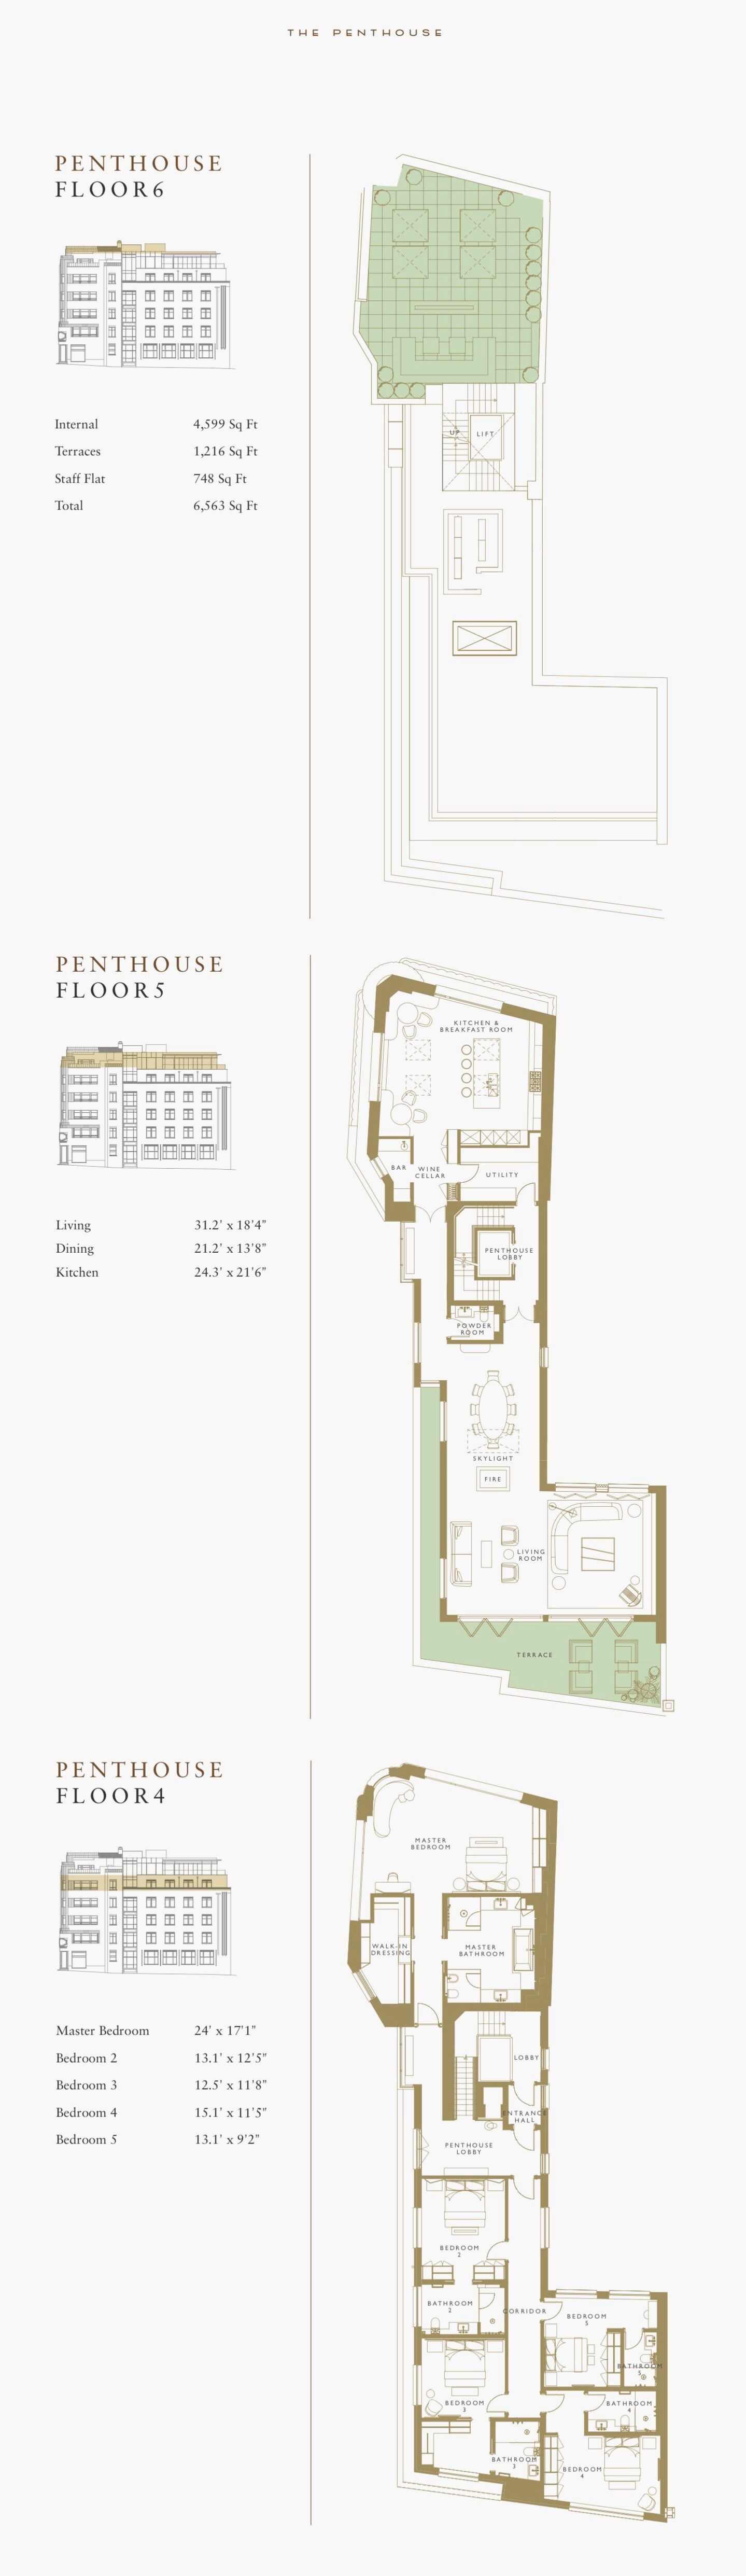 Greybrook House, London, W1K Penthouse